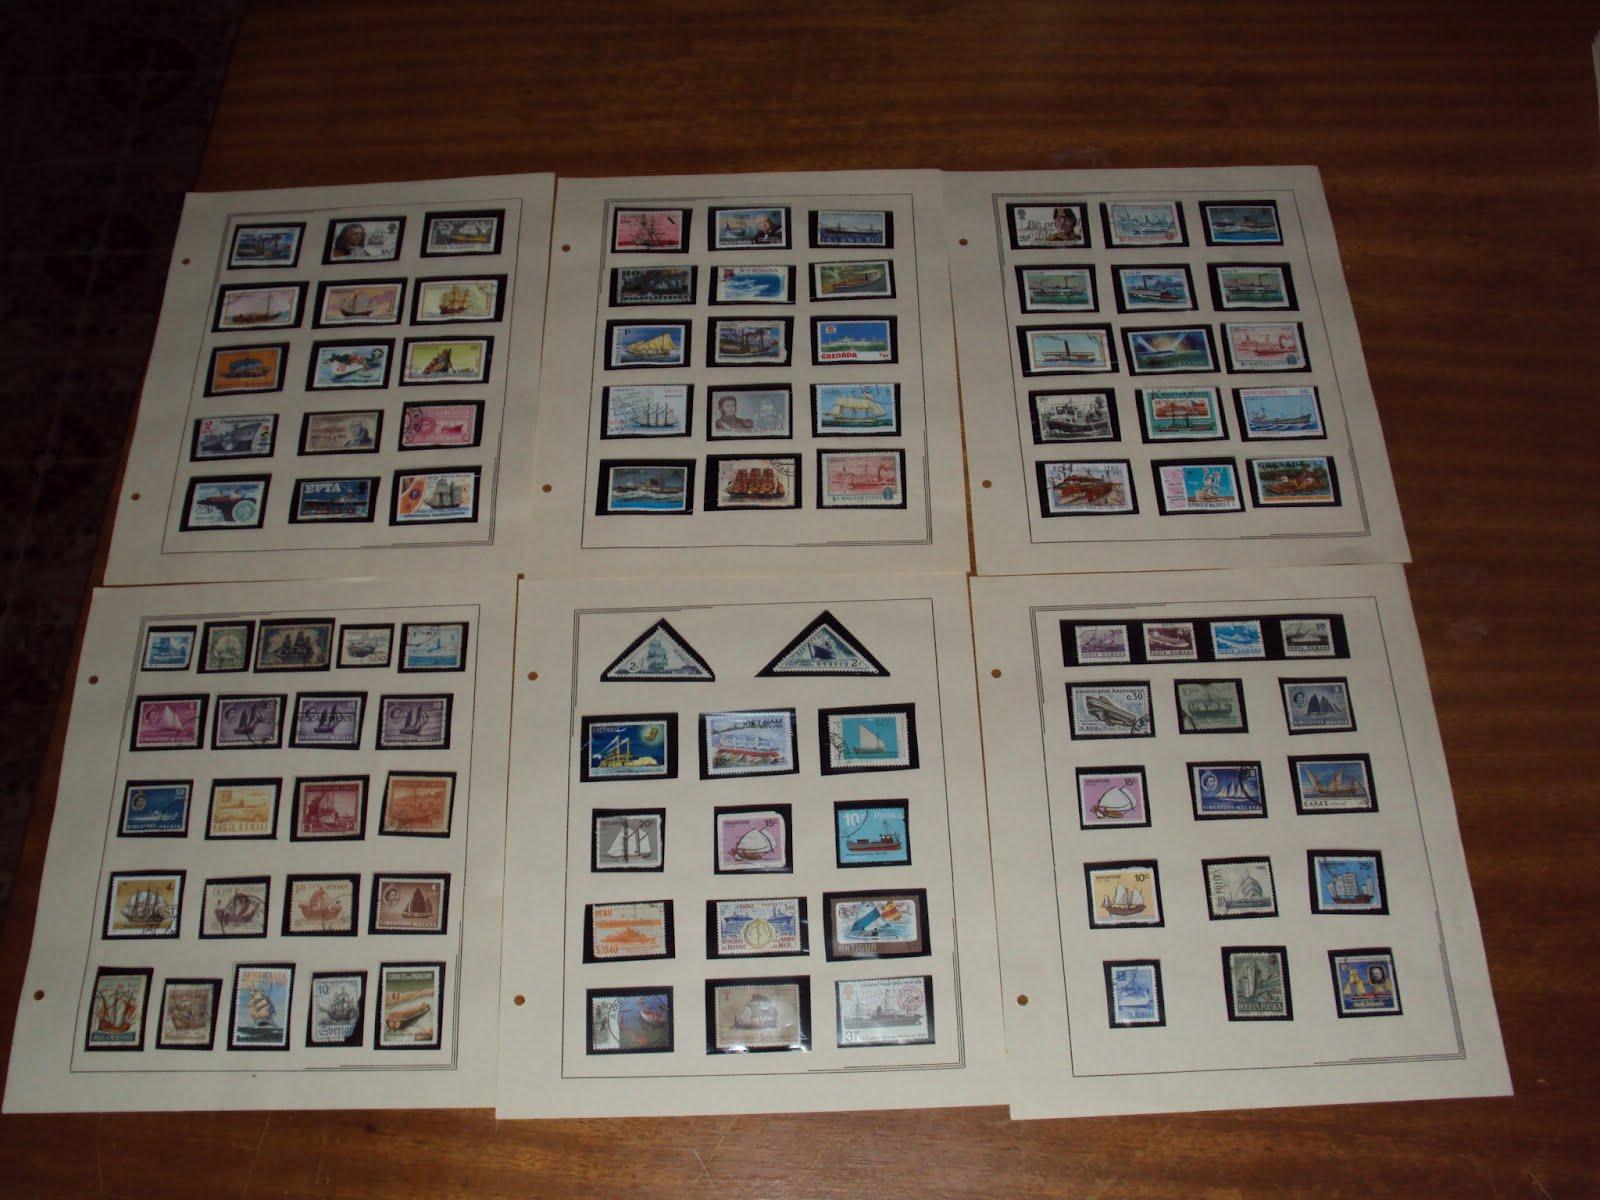 papeis+de+carta+e+selos+033.JPG (1600×1200)